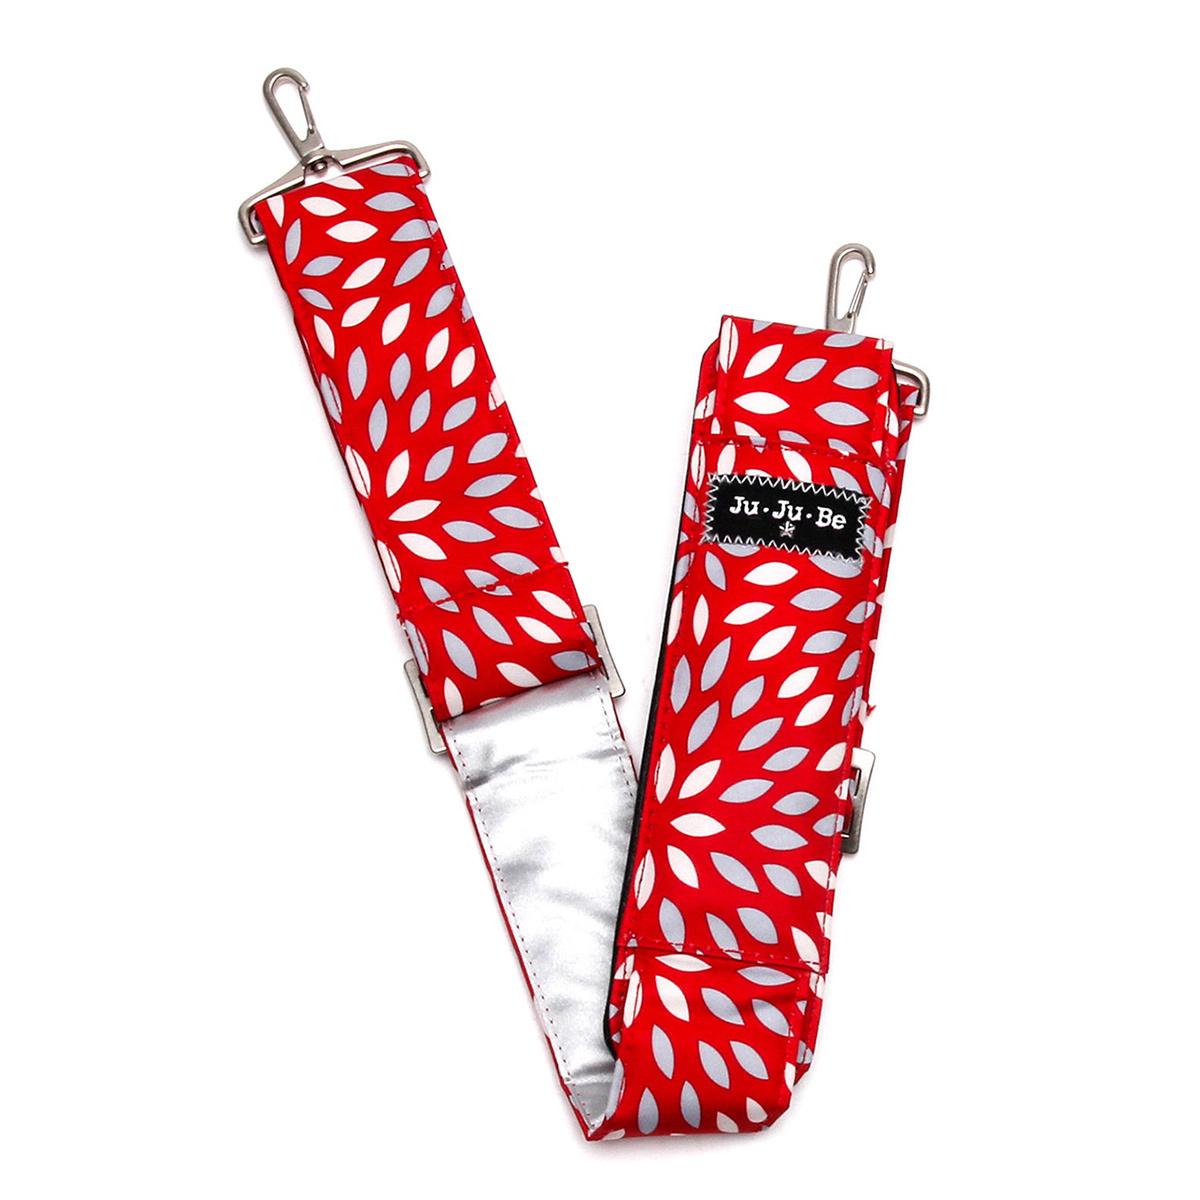 Ремни для сумки Ju-Ju-Be Messenger Strap Scarlet Petals